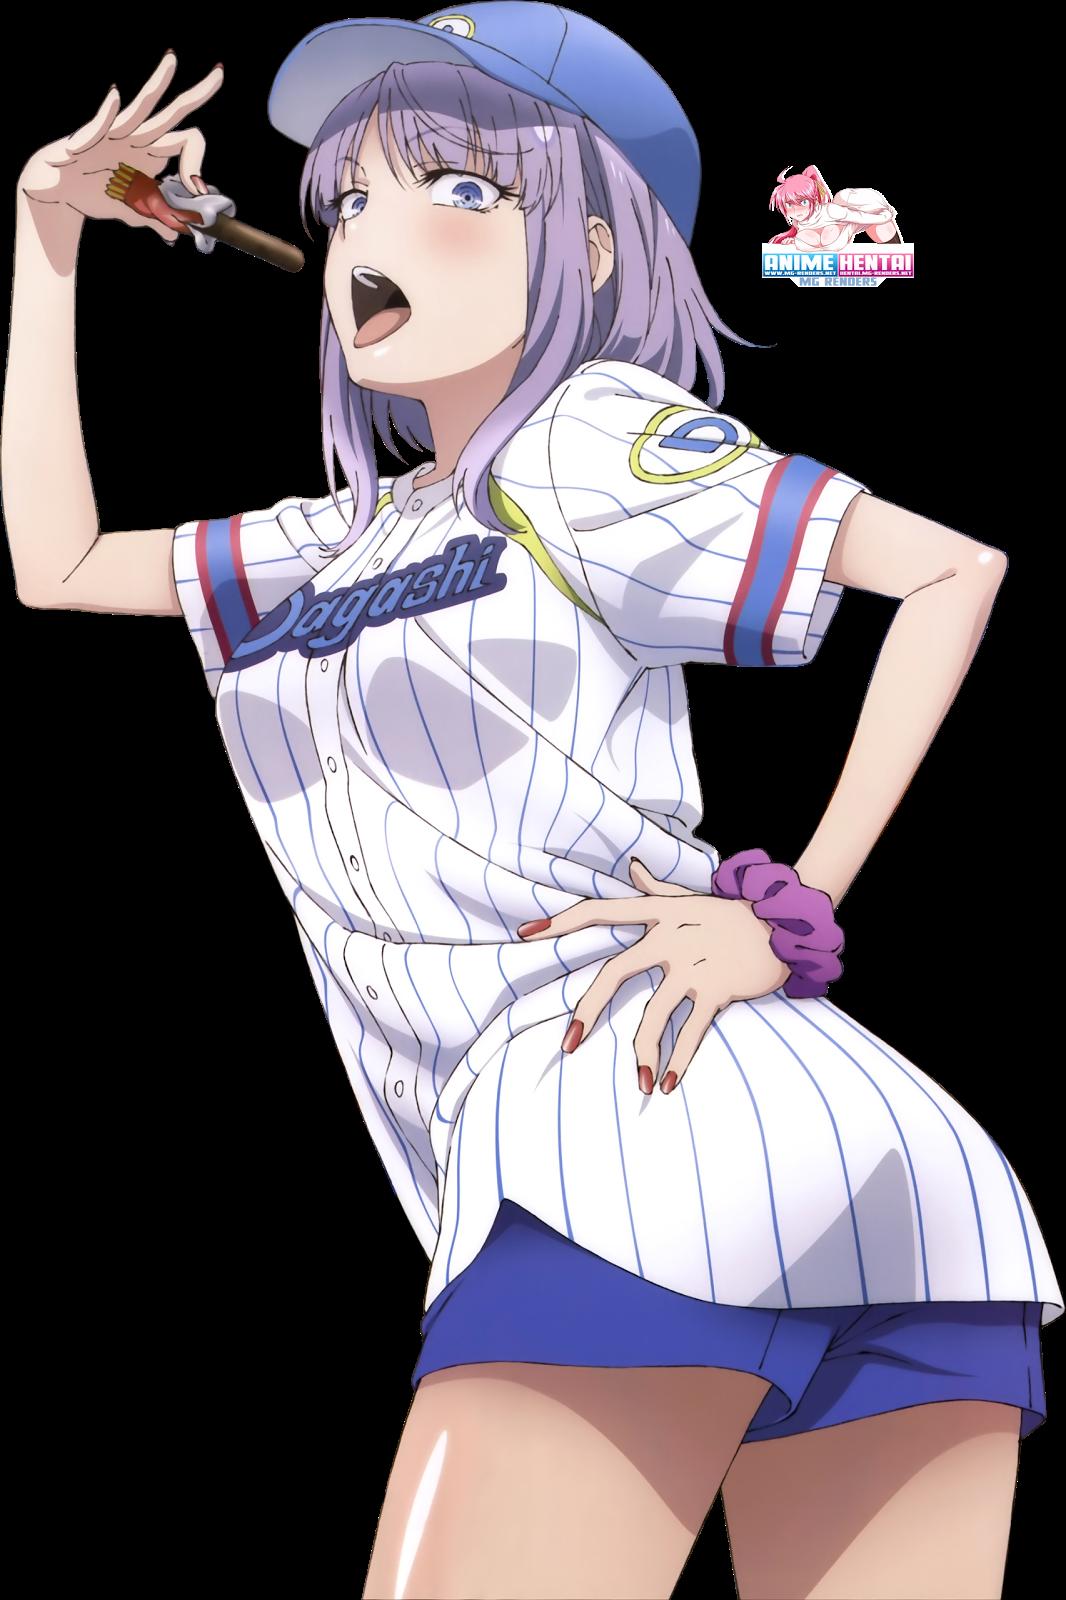 Tags: Anime, Render,  Dagashi Kashi,  Shidare Hotaru,  PNG, Image, Picture